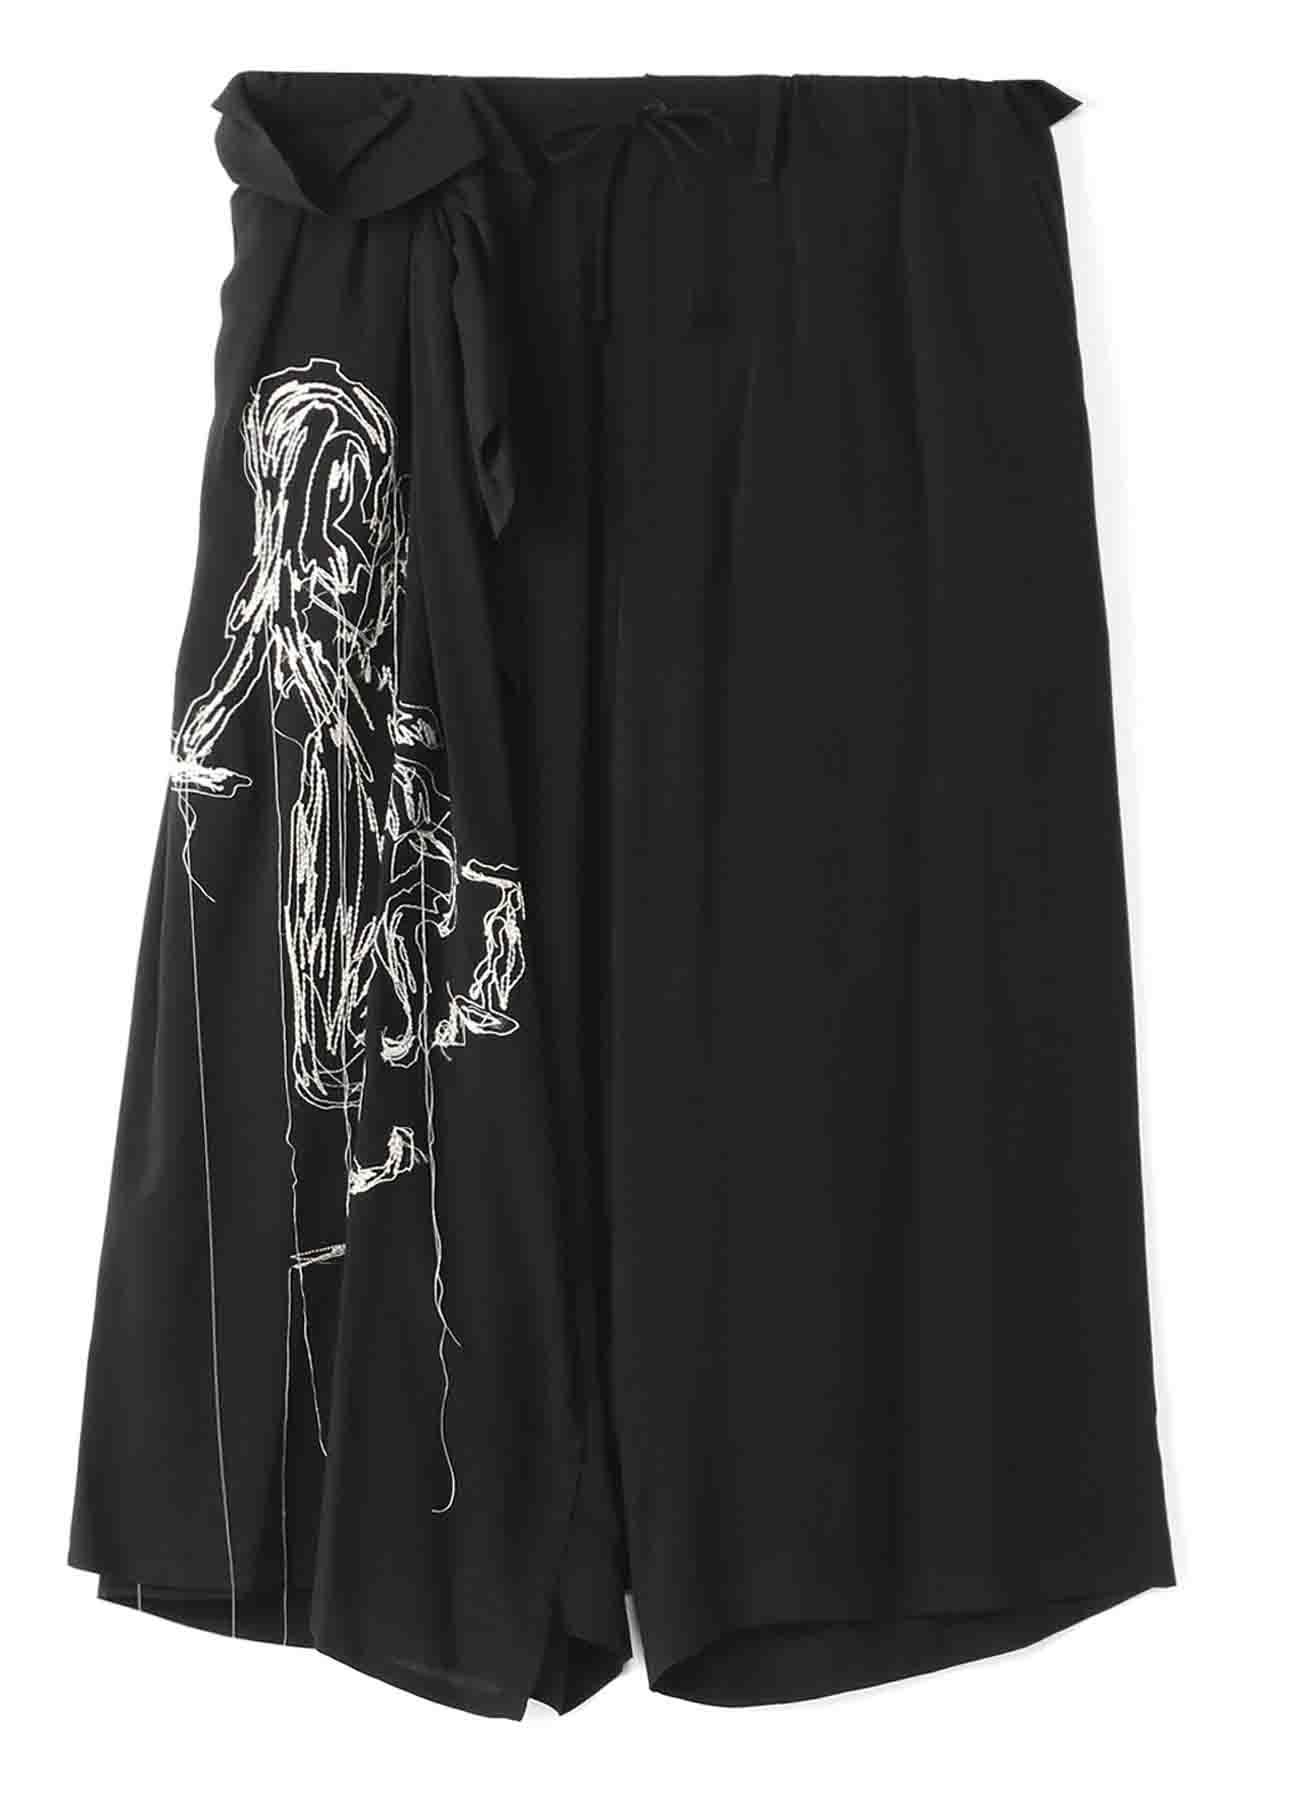 BLACK Scandal 「シルエット」刺繍ギャザースカートパンツ